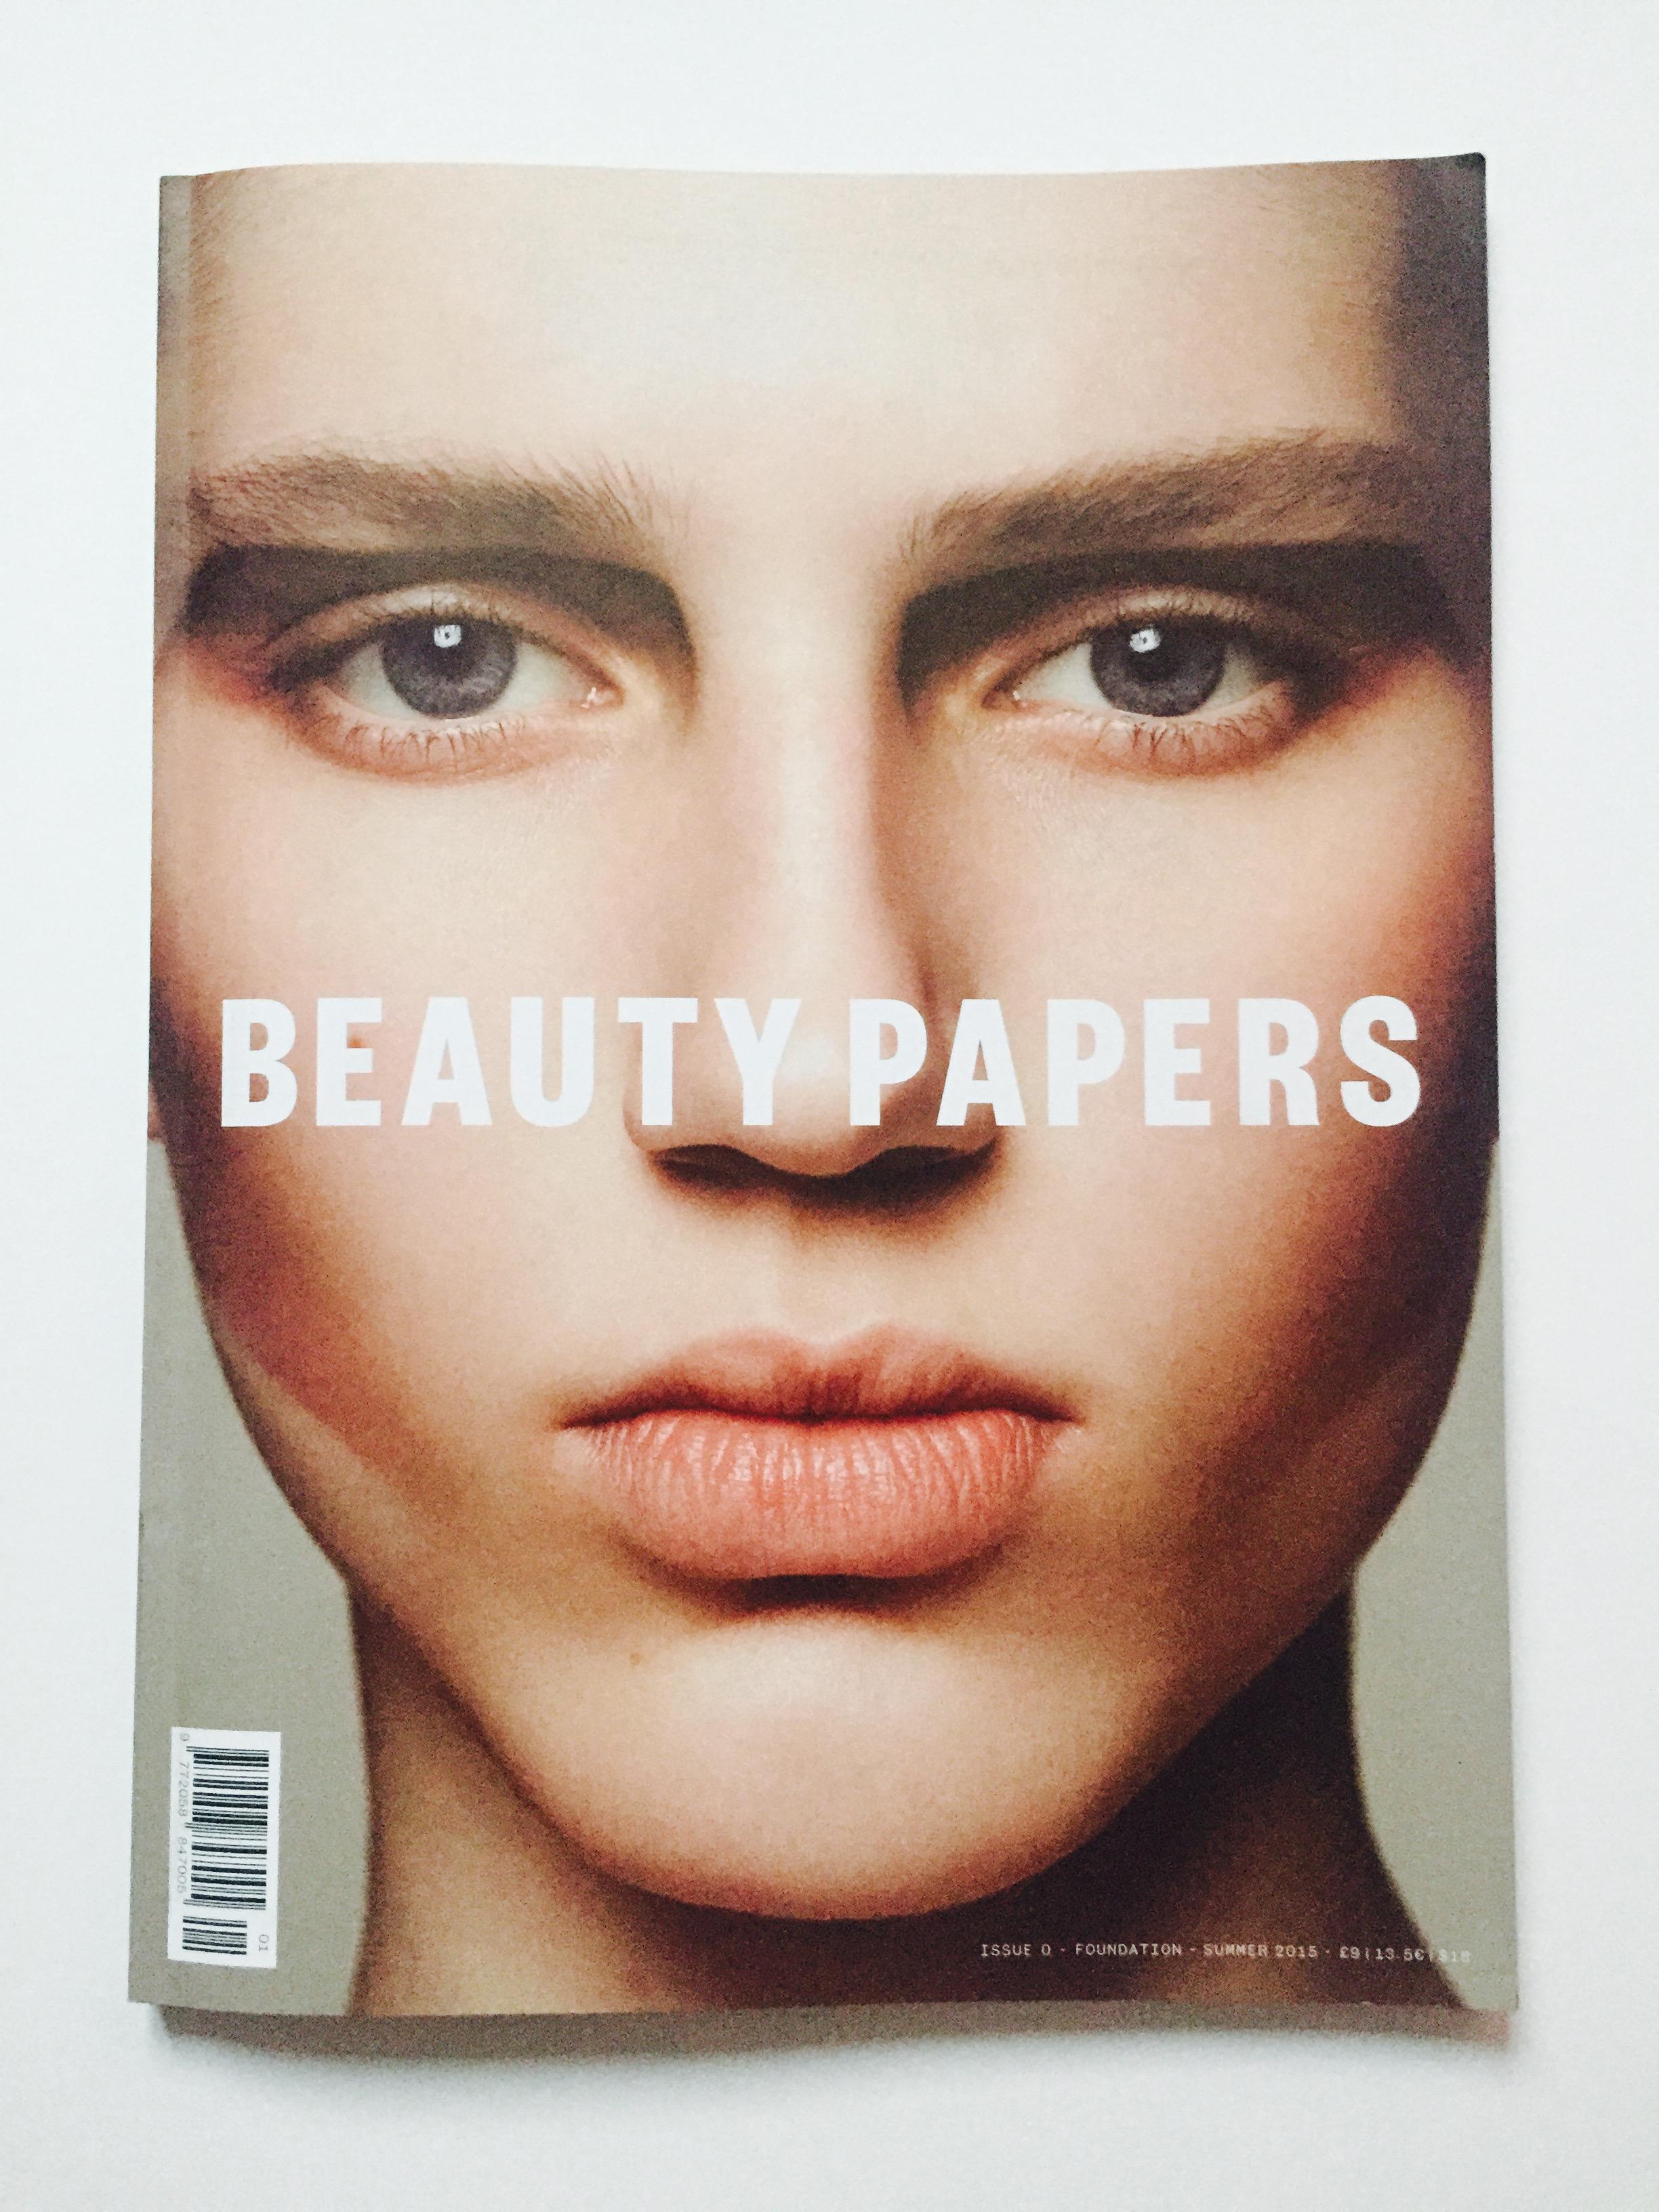 Essay on beauty